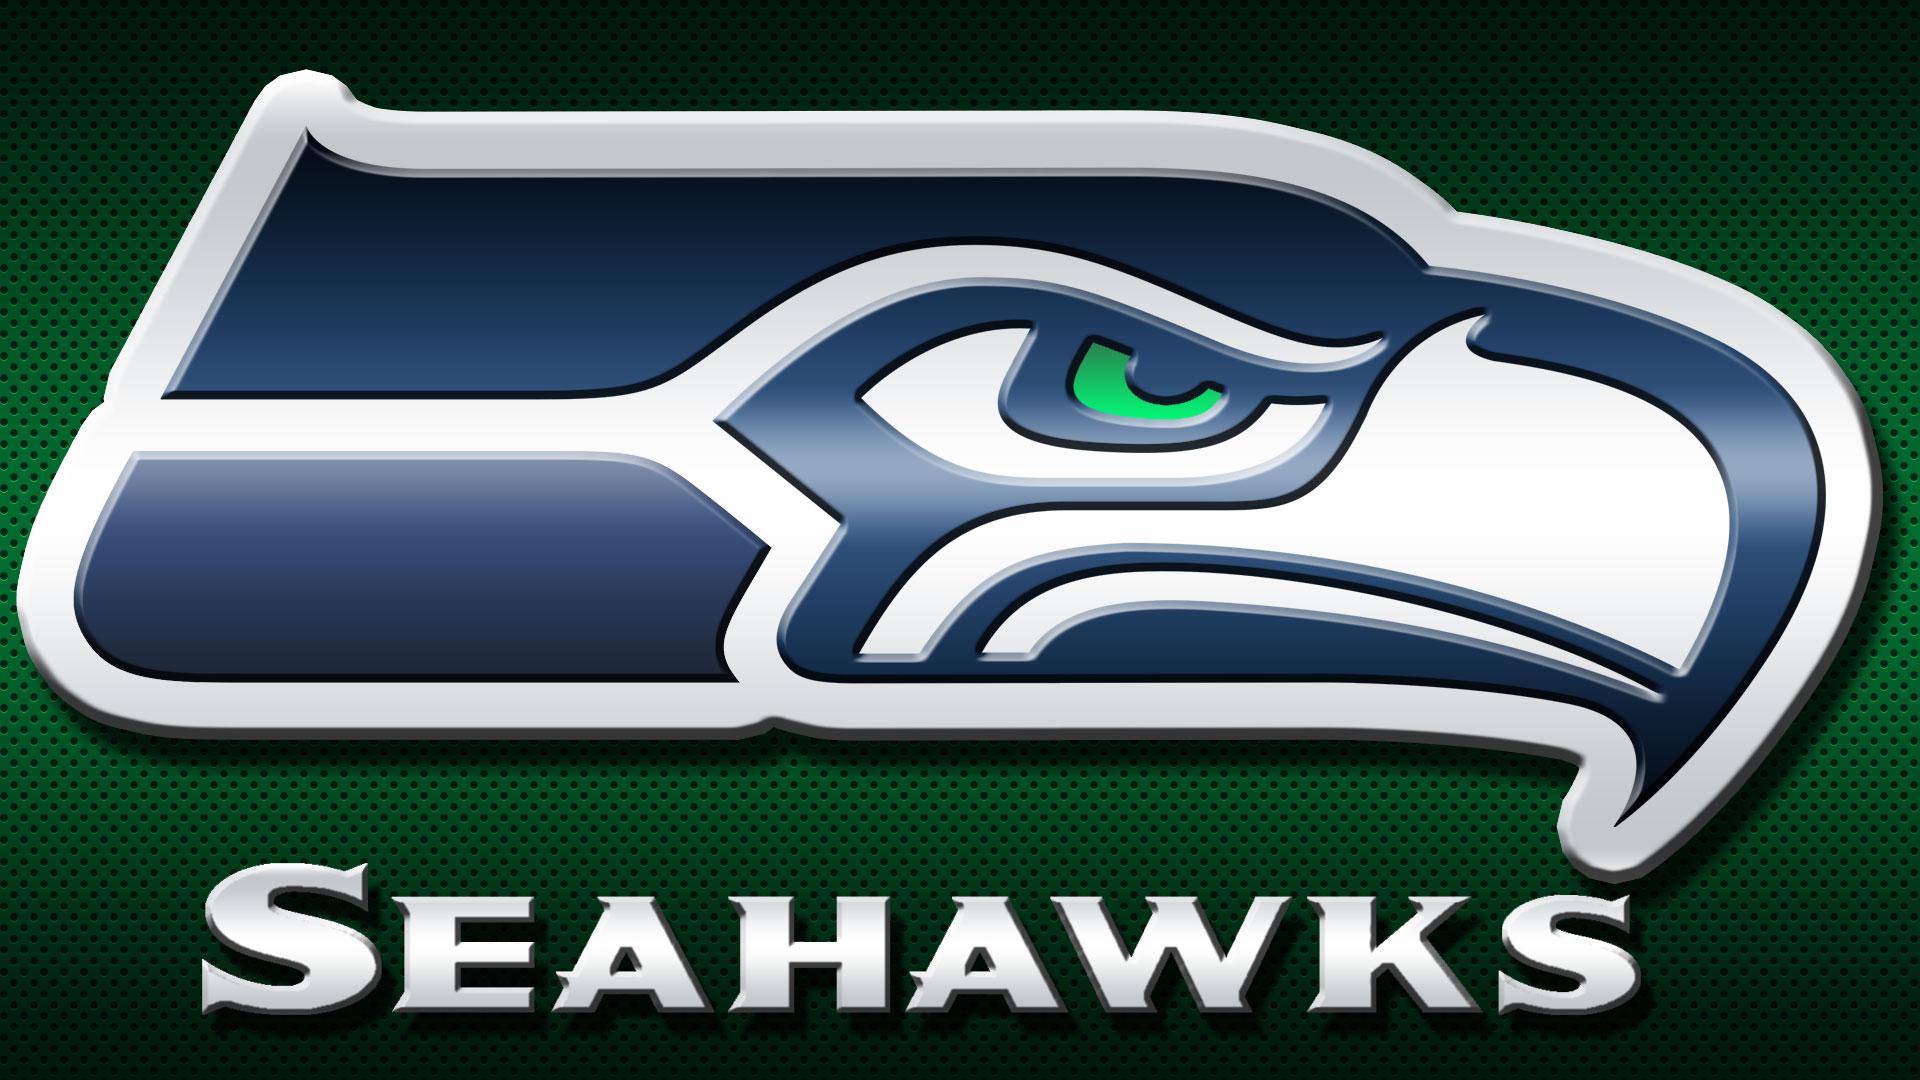 Seahawks Logo By Balsavor On Deviantart